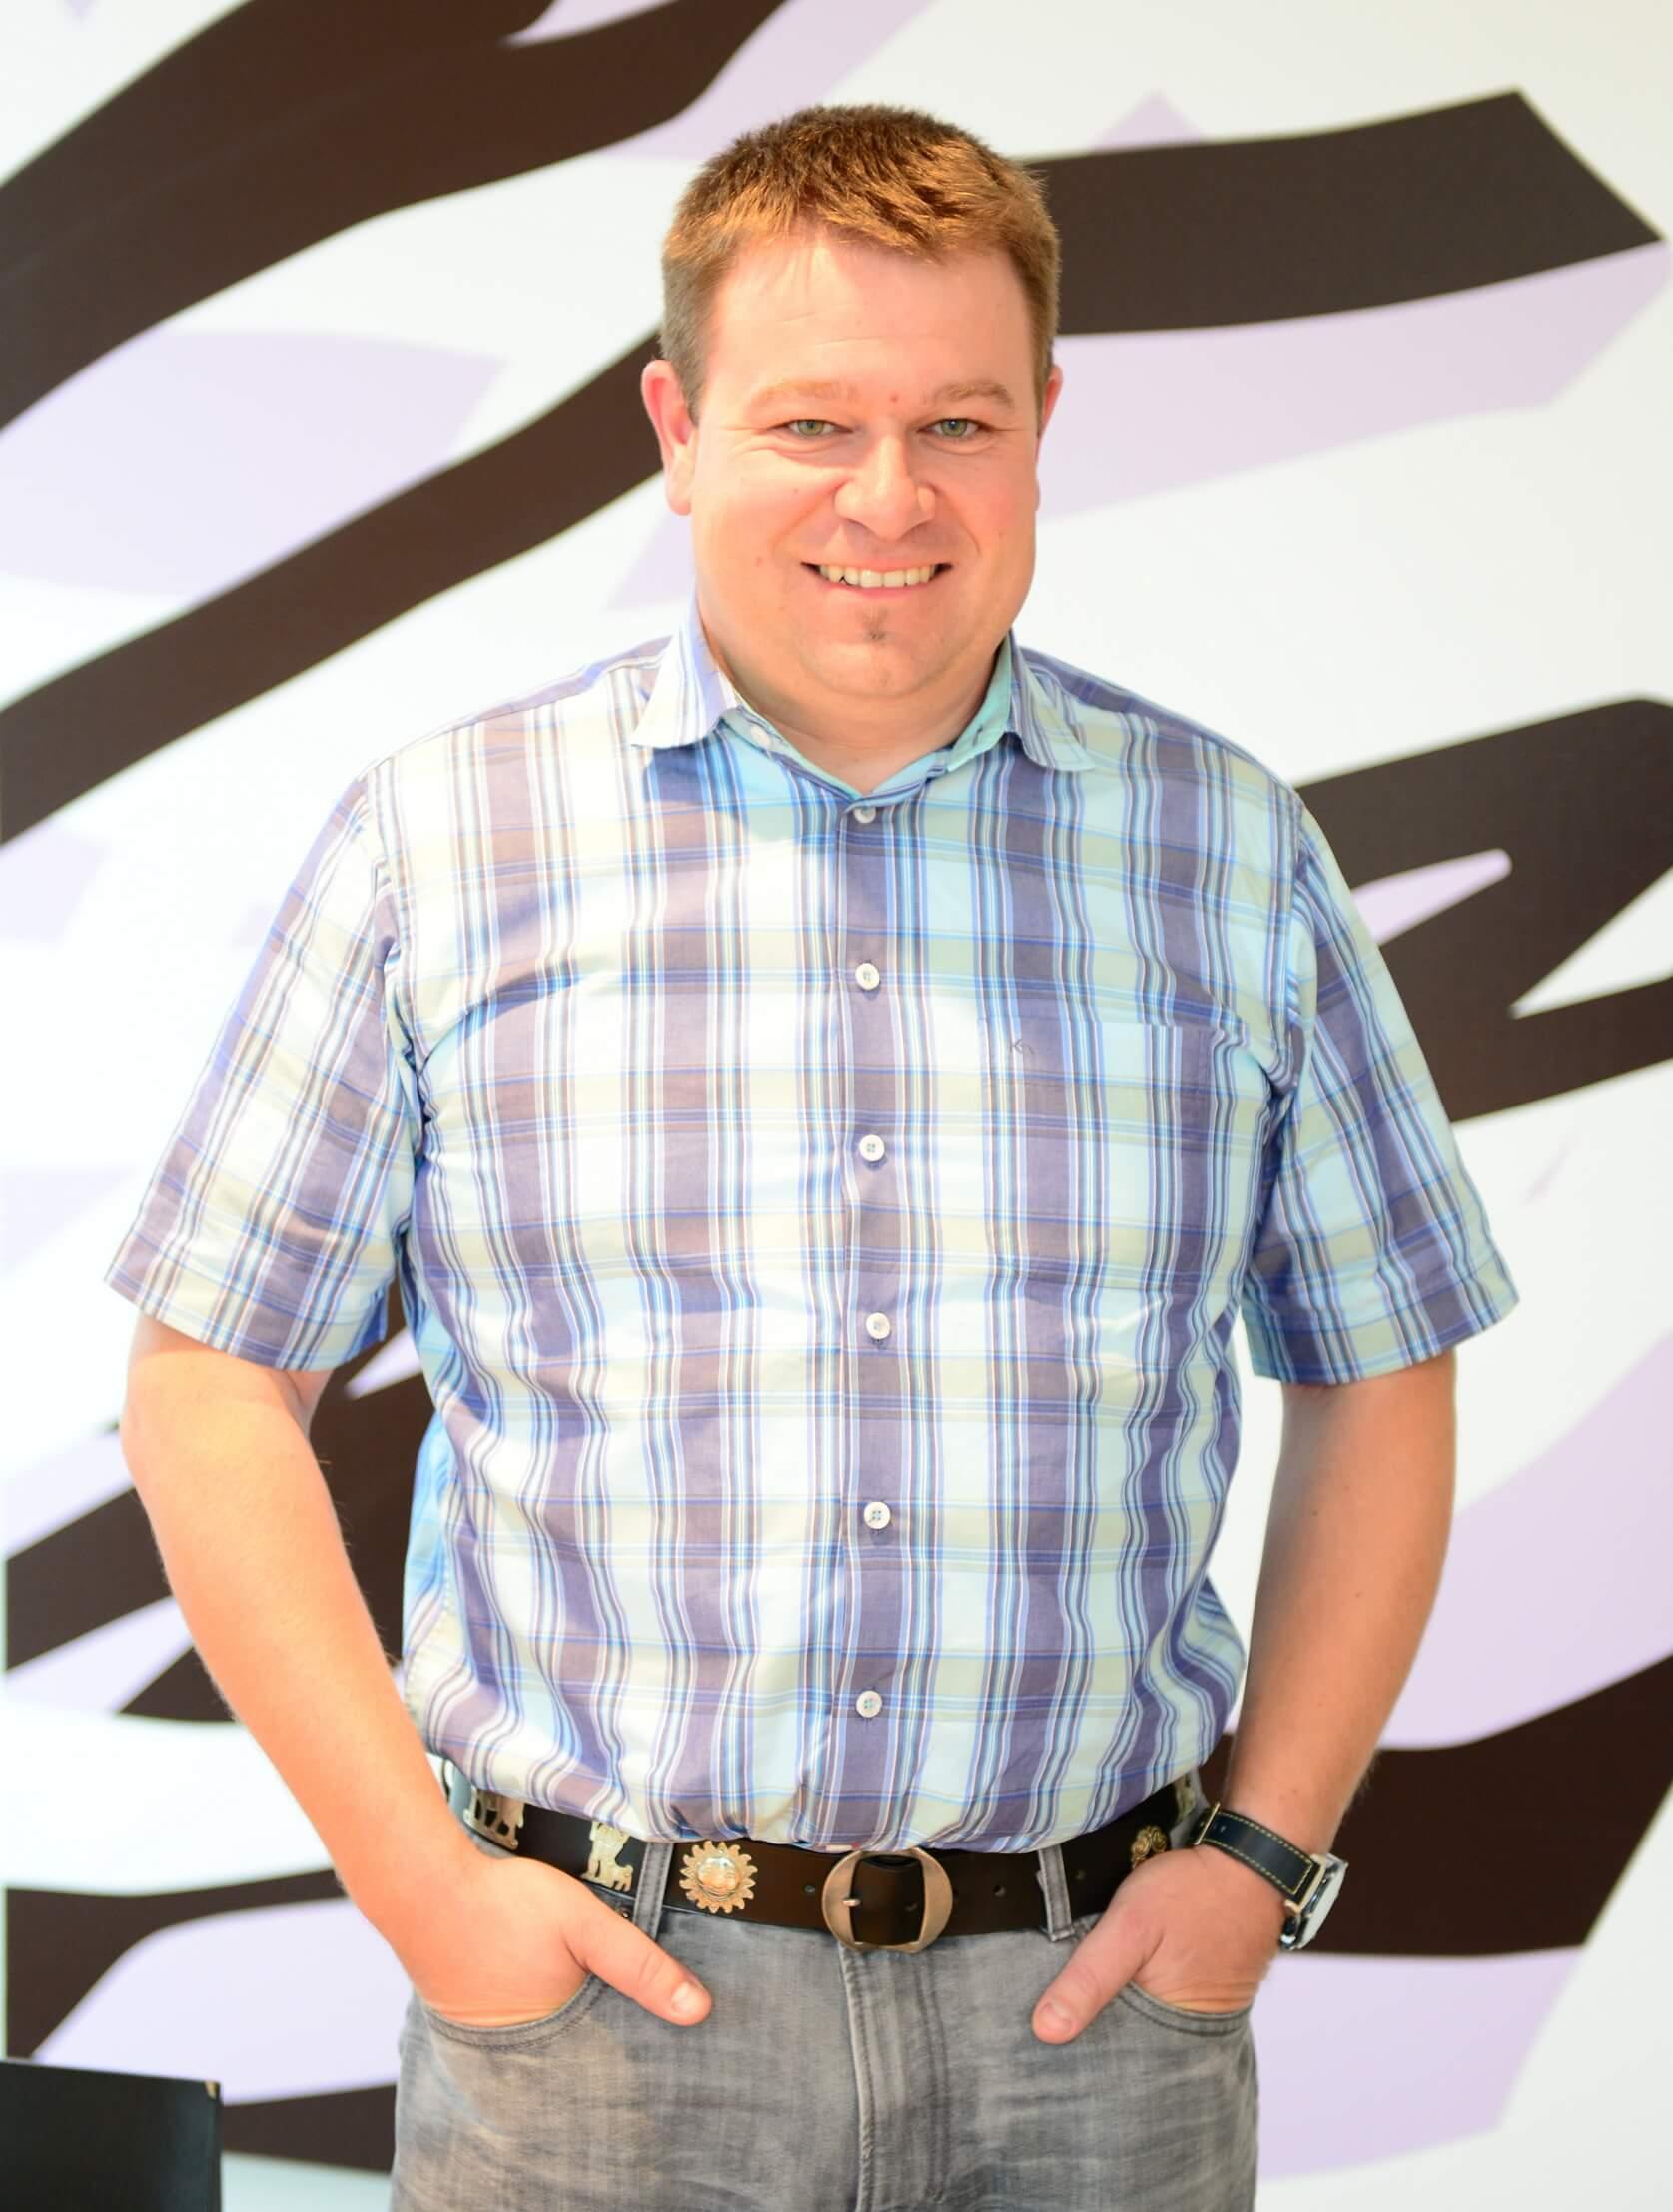 Experteninterview mit Michael Kummer